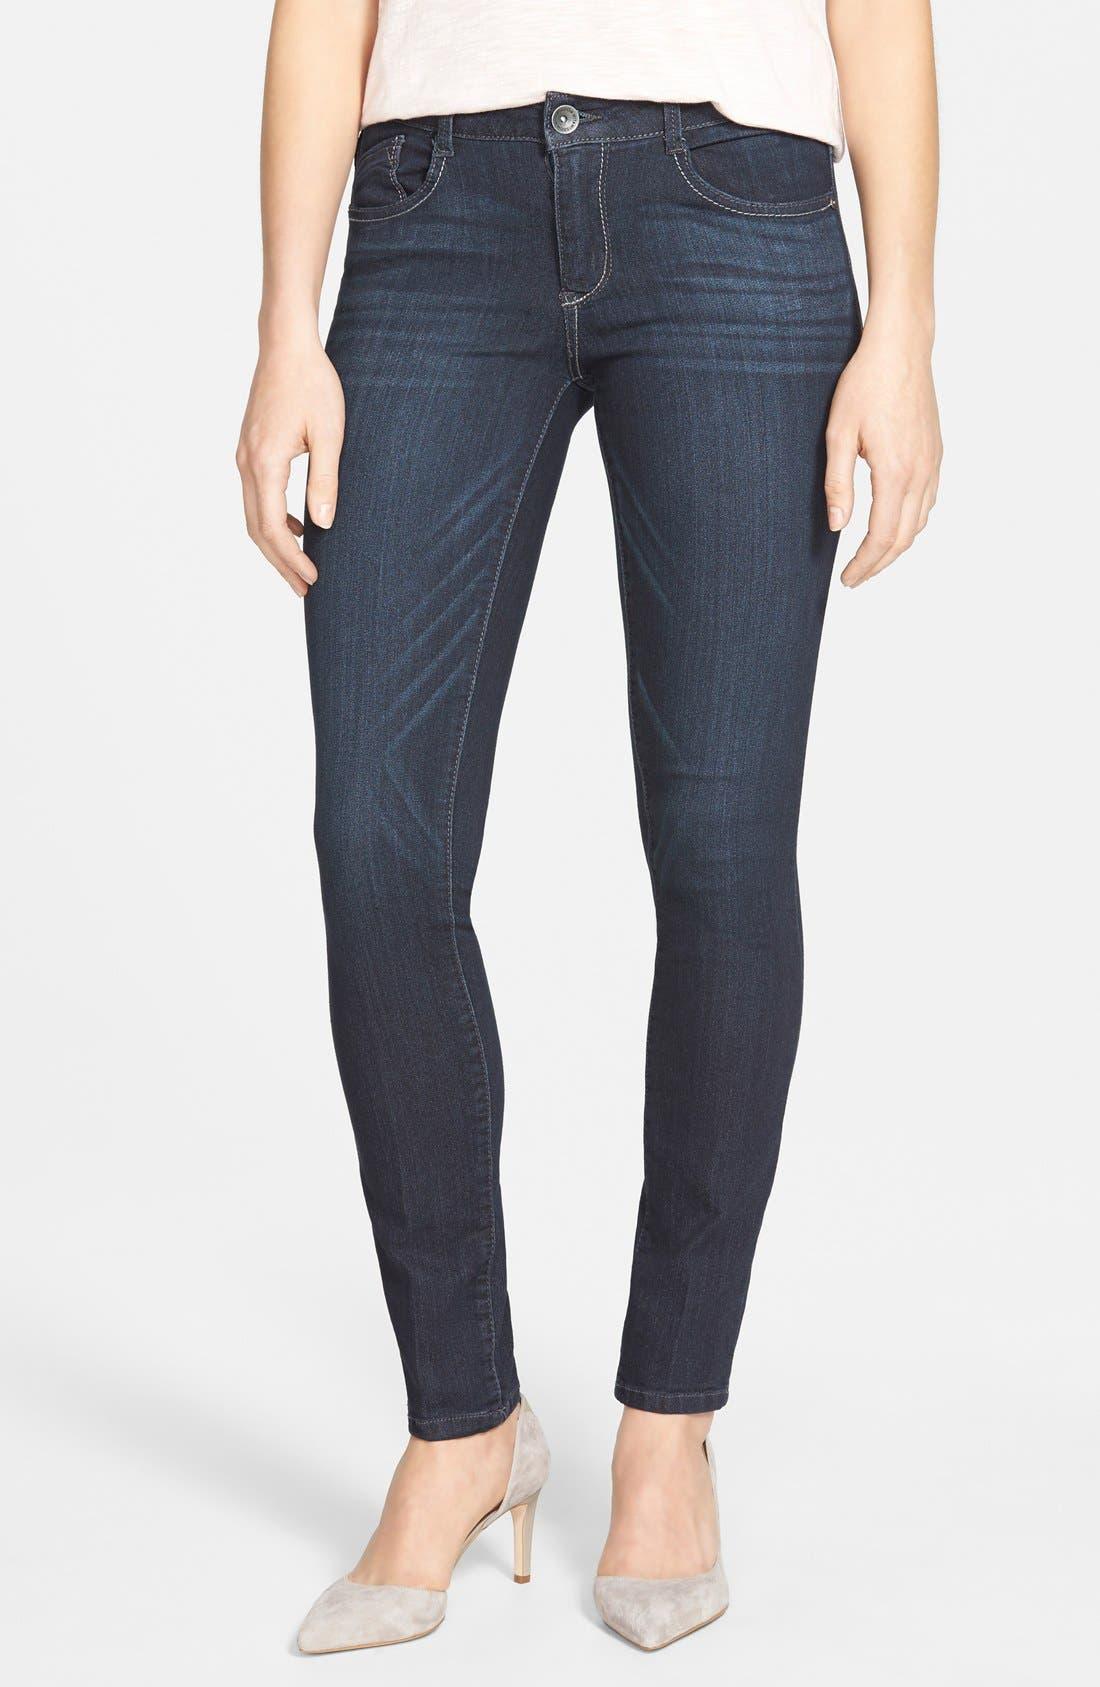 Misses stretch denim skinny jeans